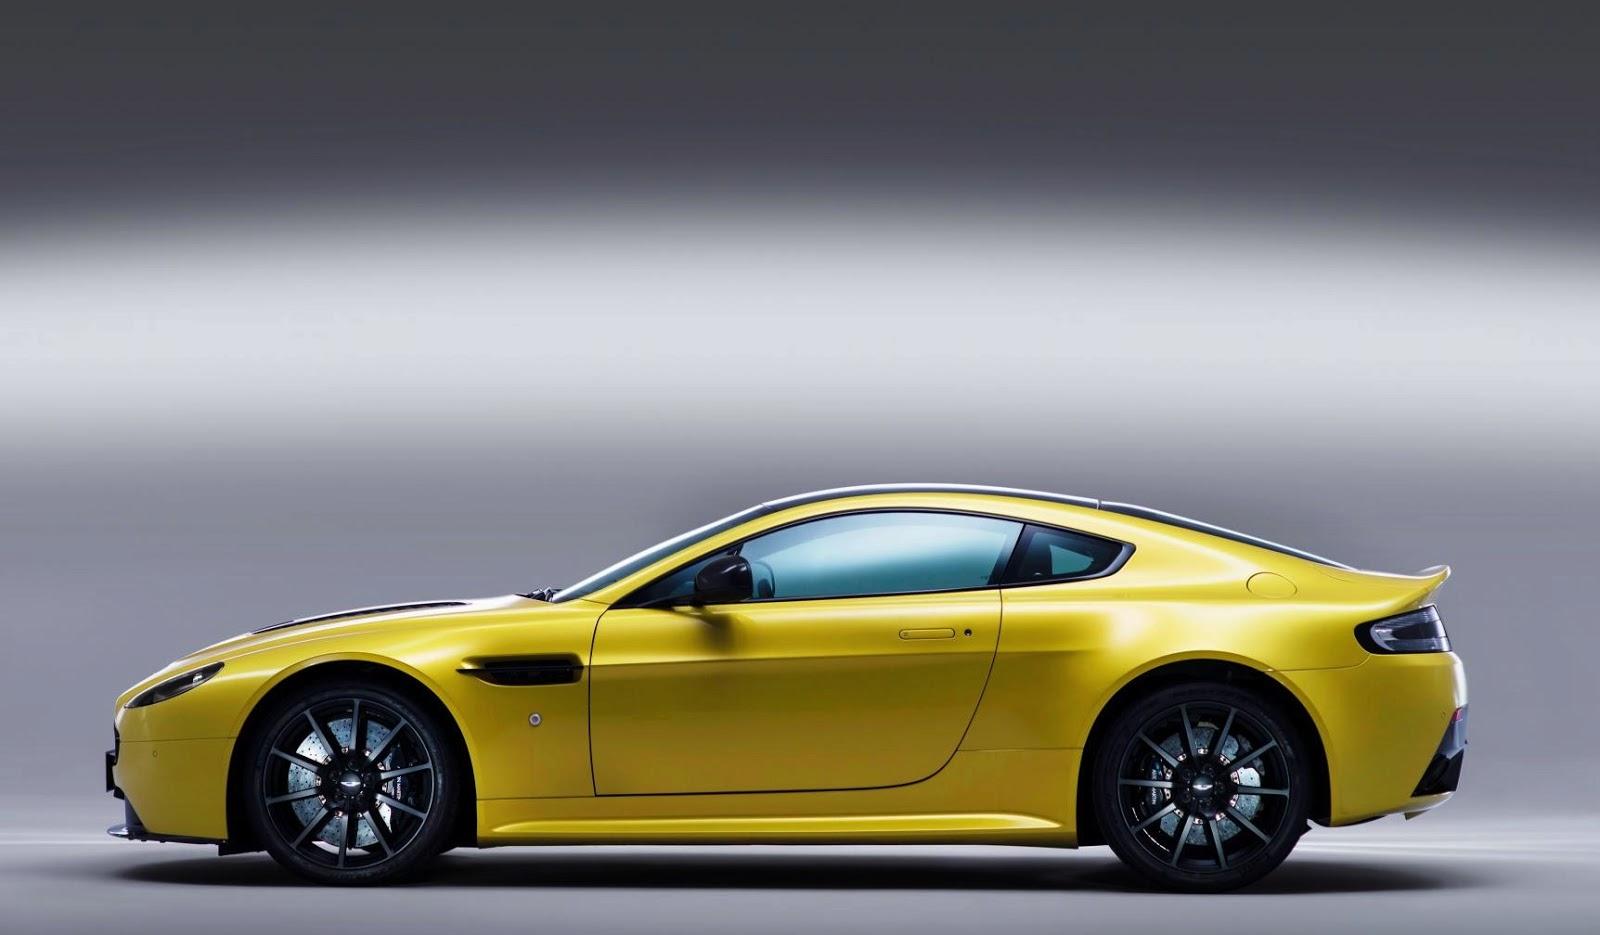 Aston Martin V12 Vantage S Humungous Engine In Quite A Small Car